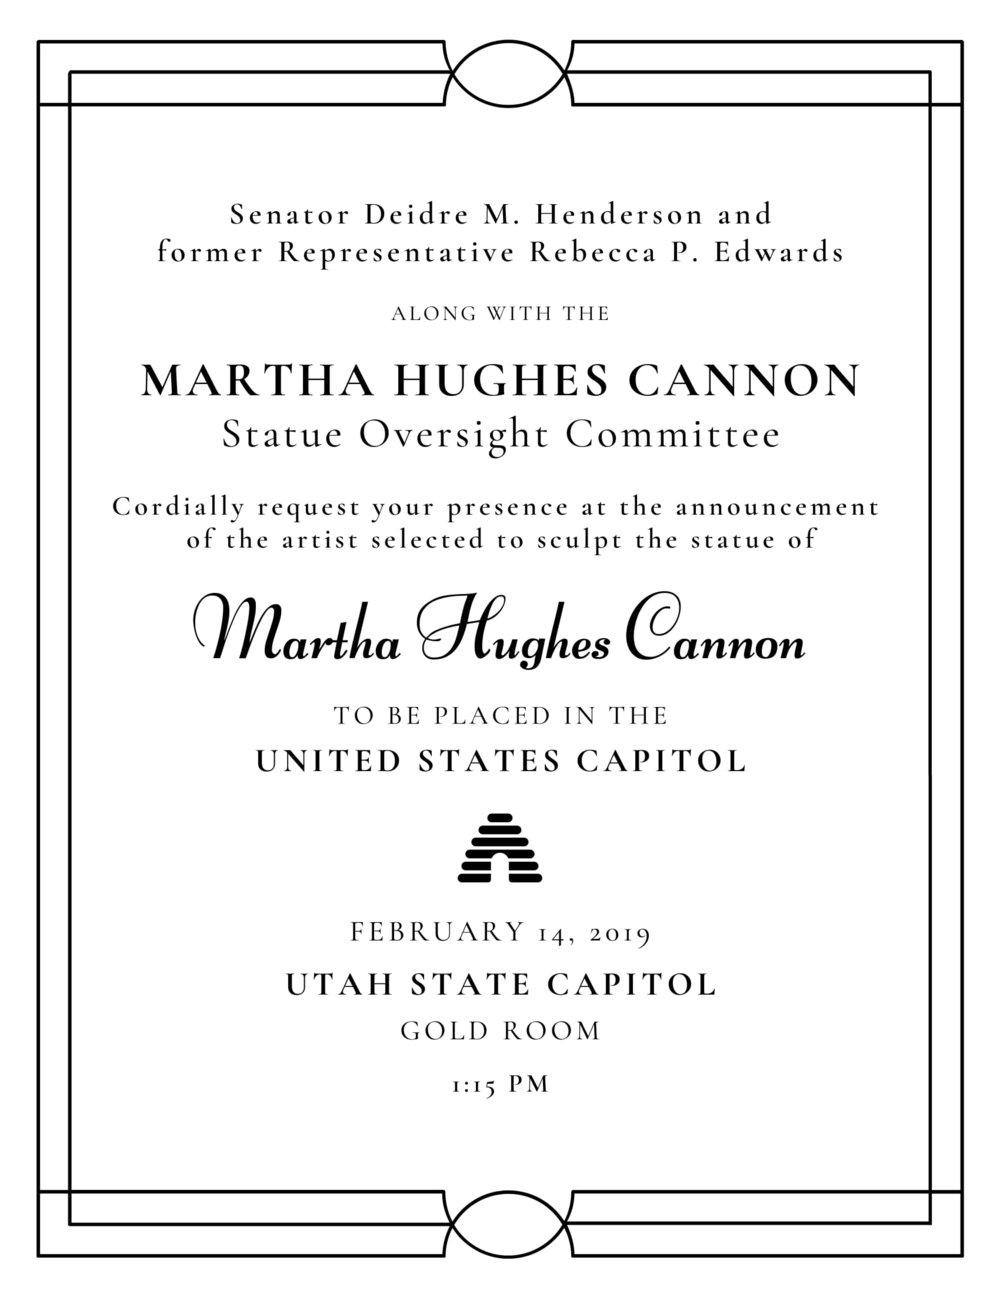 Martha Hughes Cannon Invite 2-1.jpg